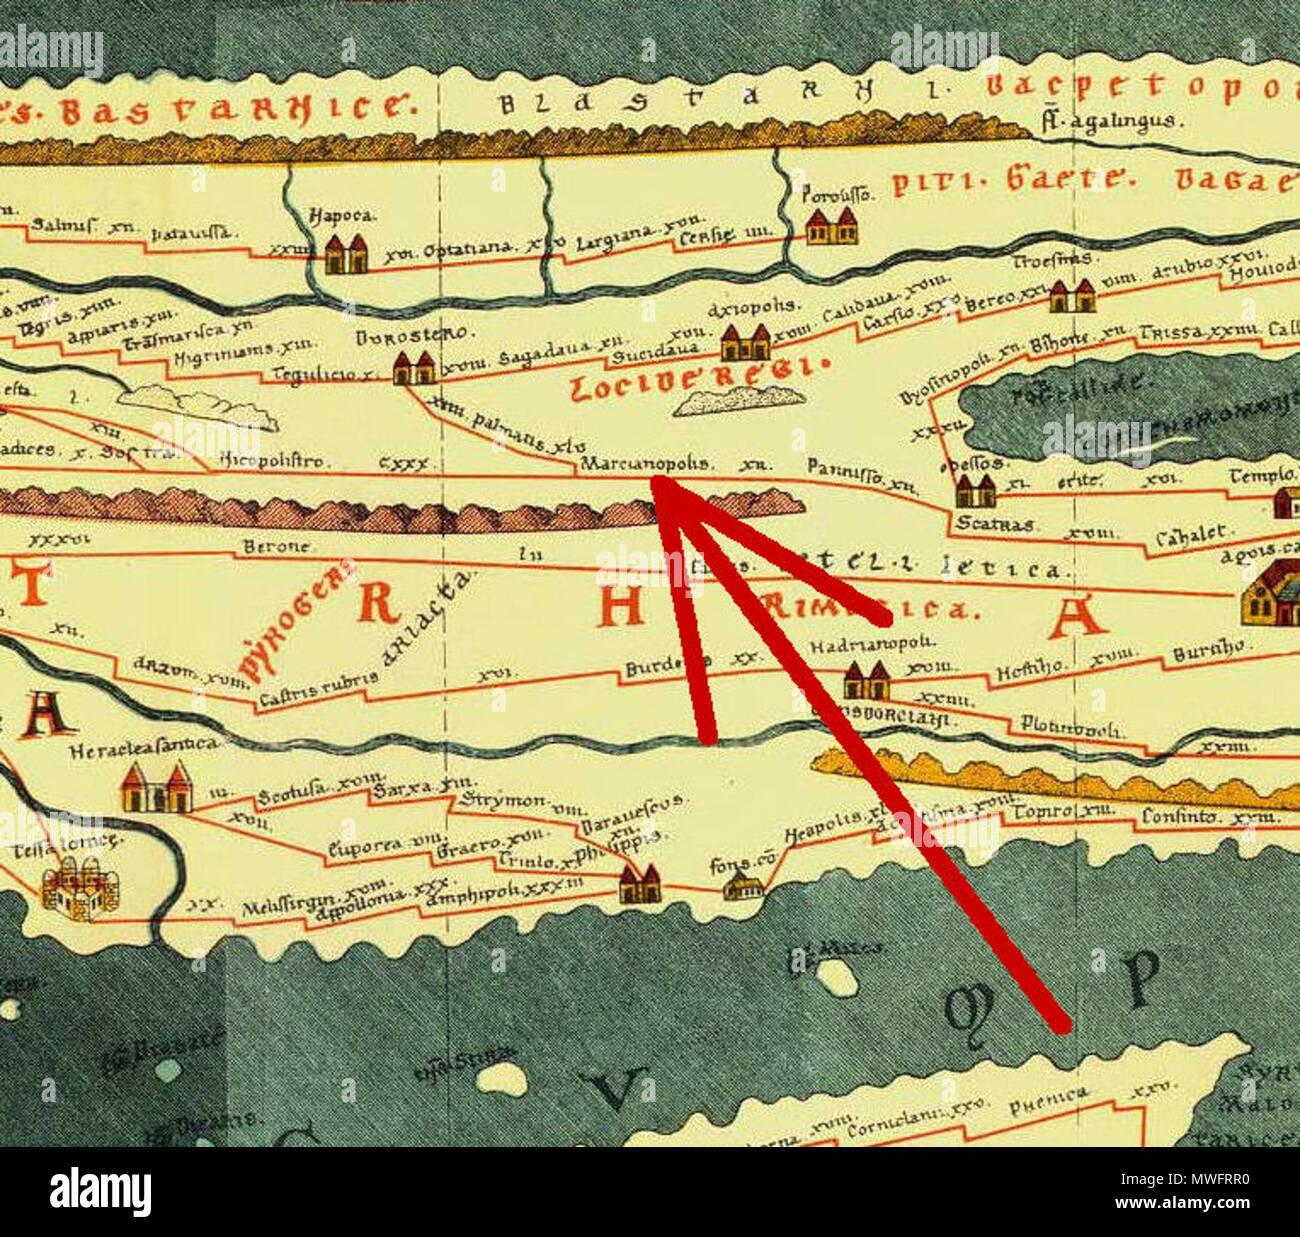 Bulgarien Karte Deutsch.English Cutout From Tabula Peutingeriana 1 4th Century Ce